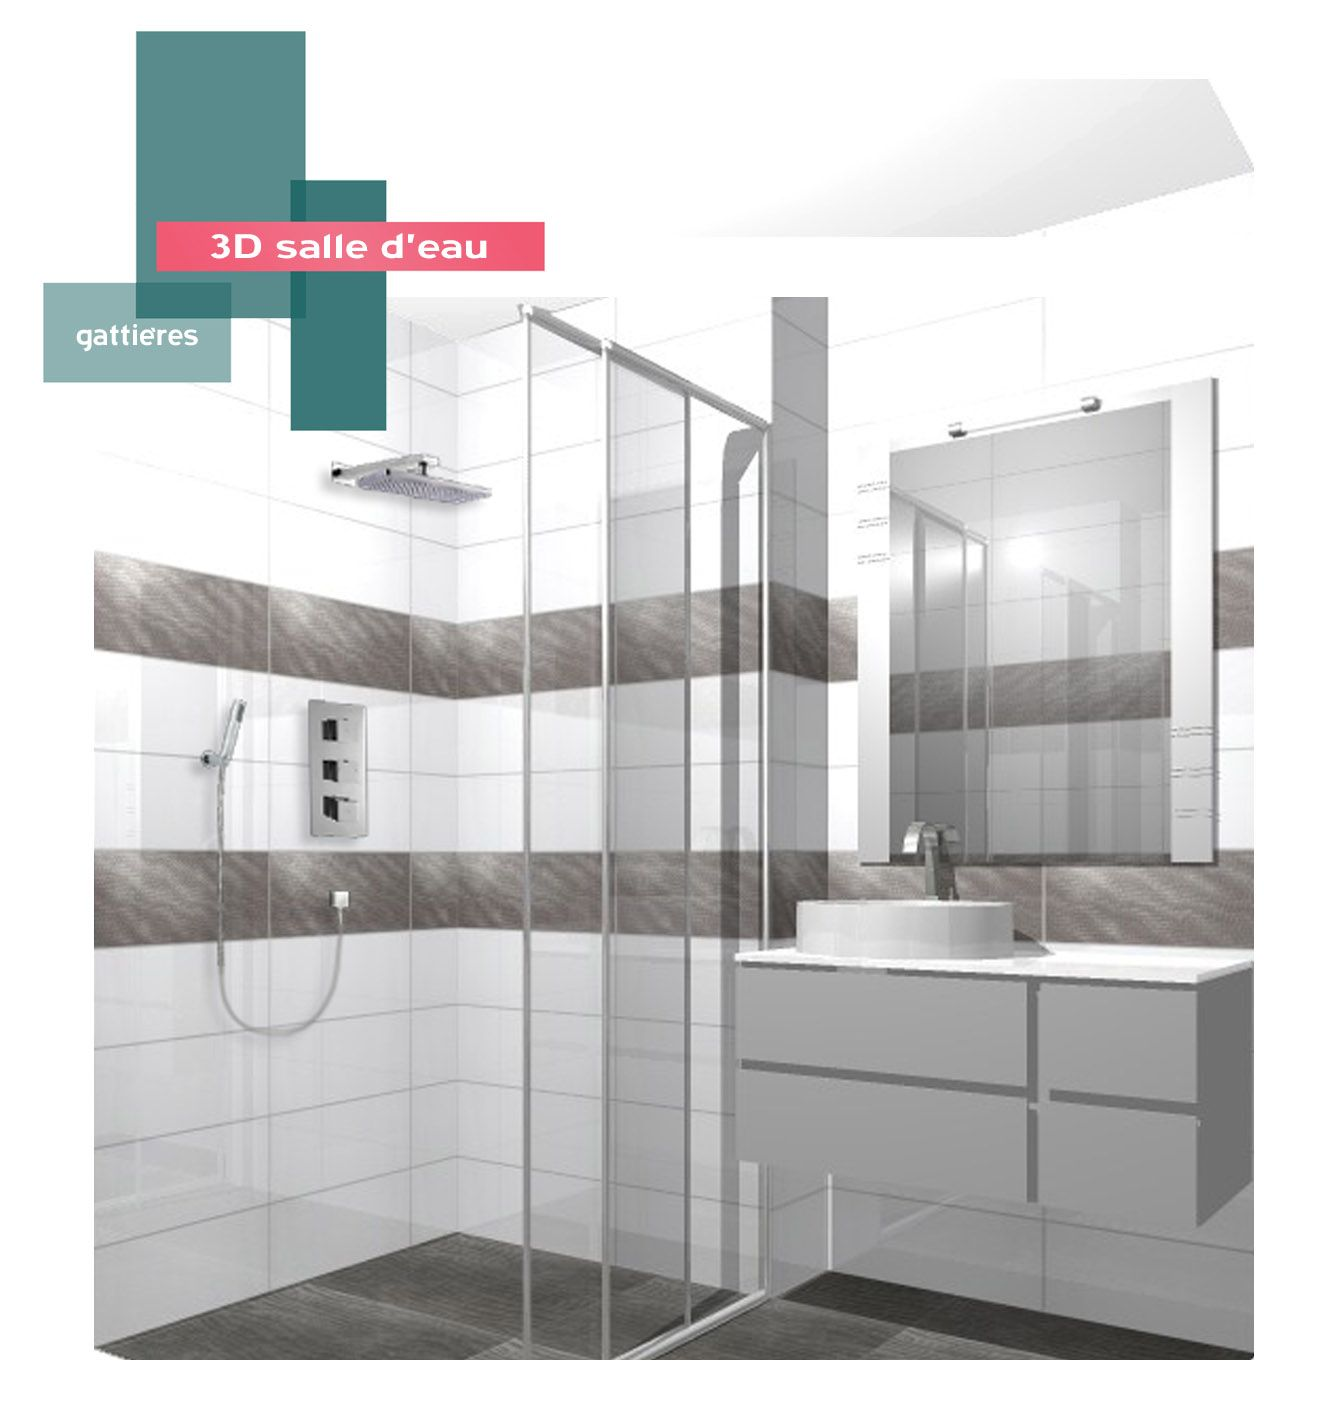 salle d 39 eau b indoor www b decoration design agencement contemporain art. Black Bedroom Furniture Sets. Home Design Ideas